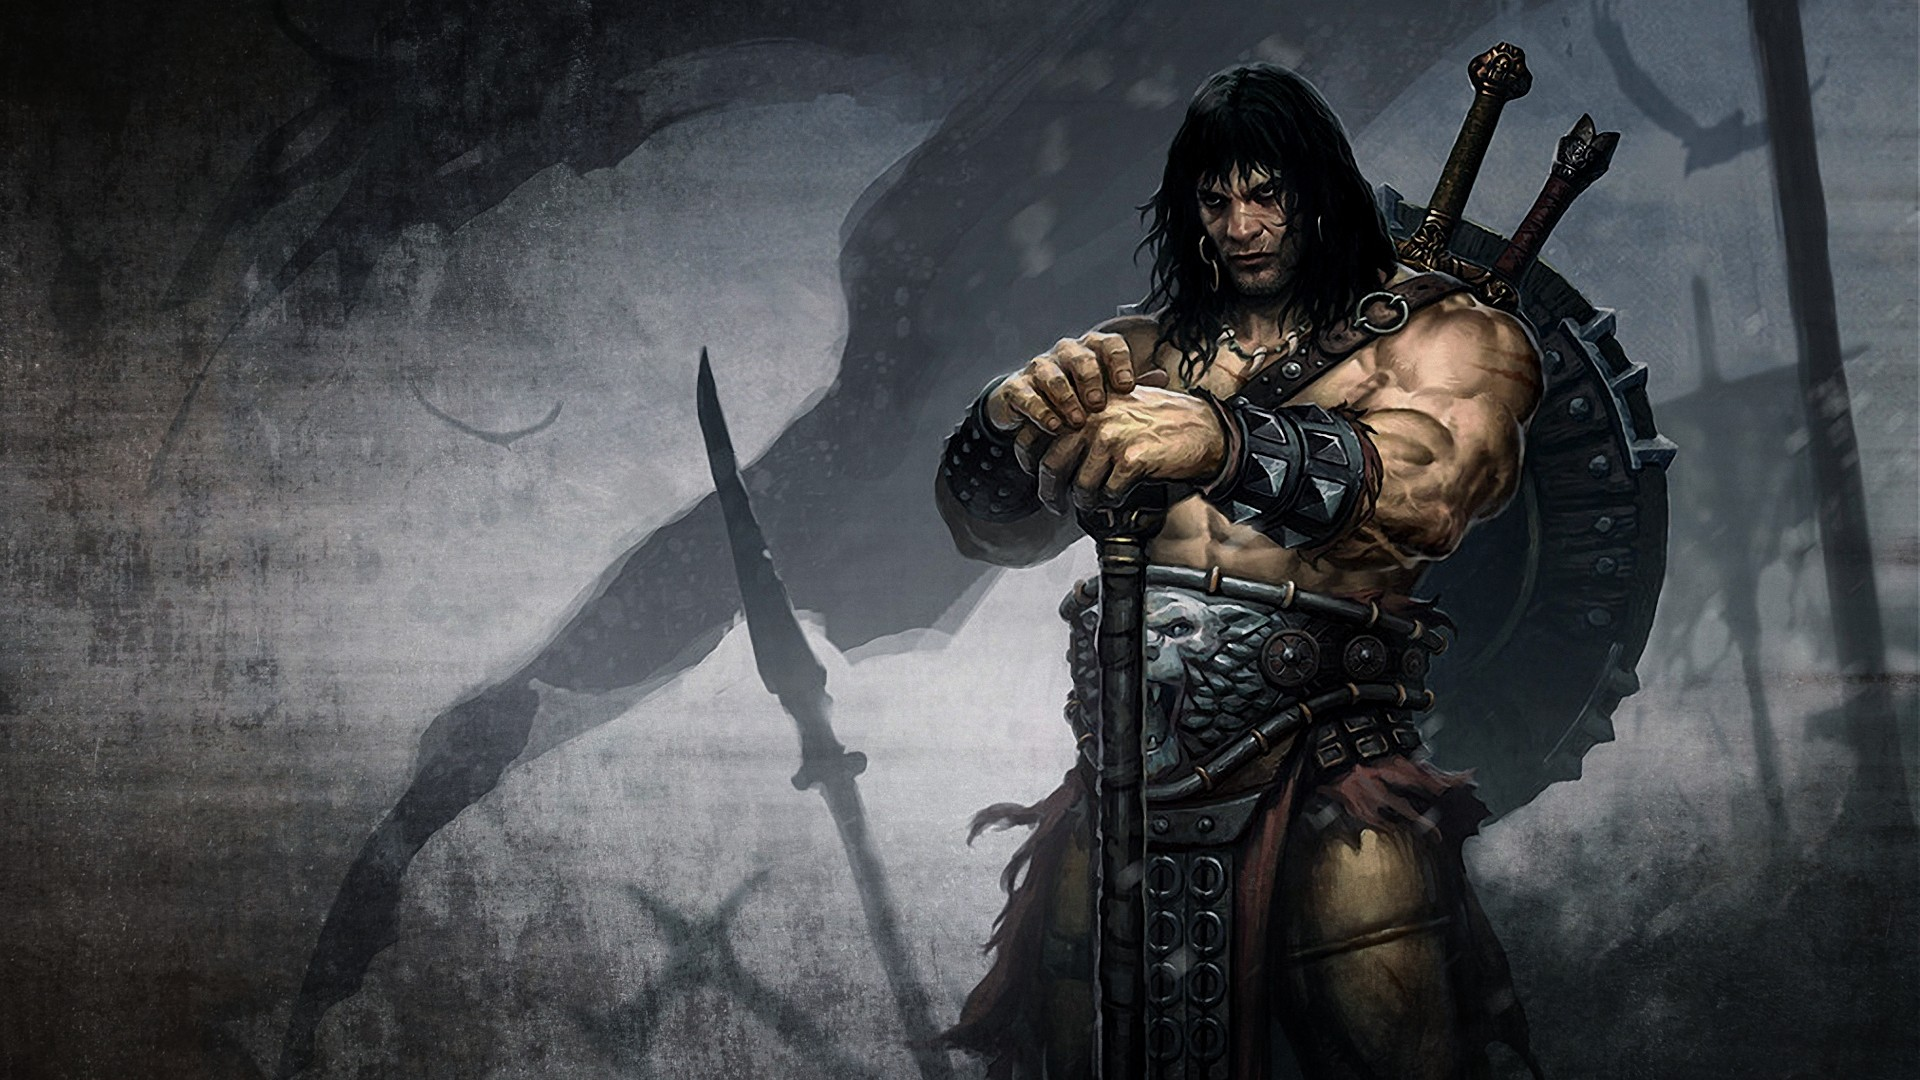 72 Conan The Barbarian Wallpapers On Wallpapersafari